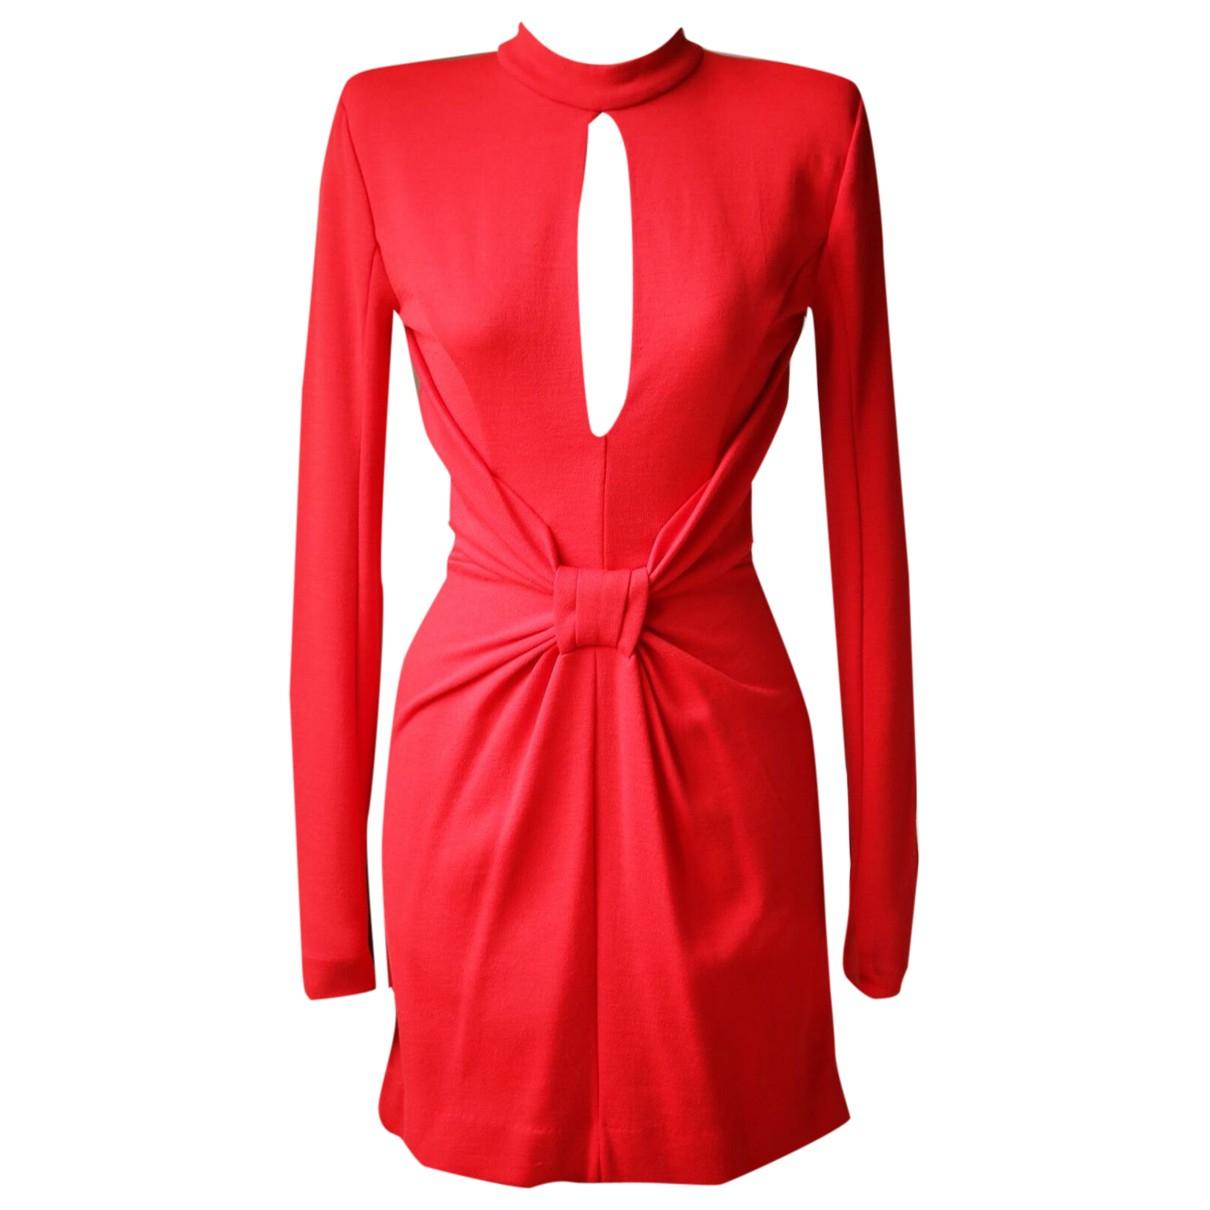 Balmain N Red Wool dress for Women 36 FR